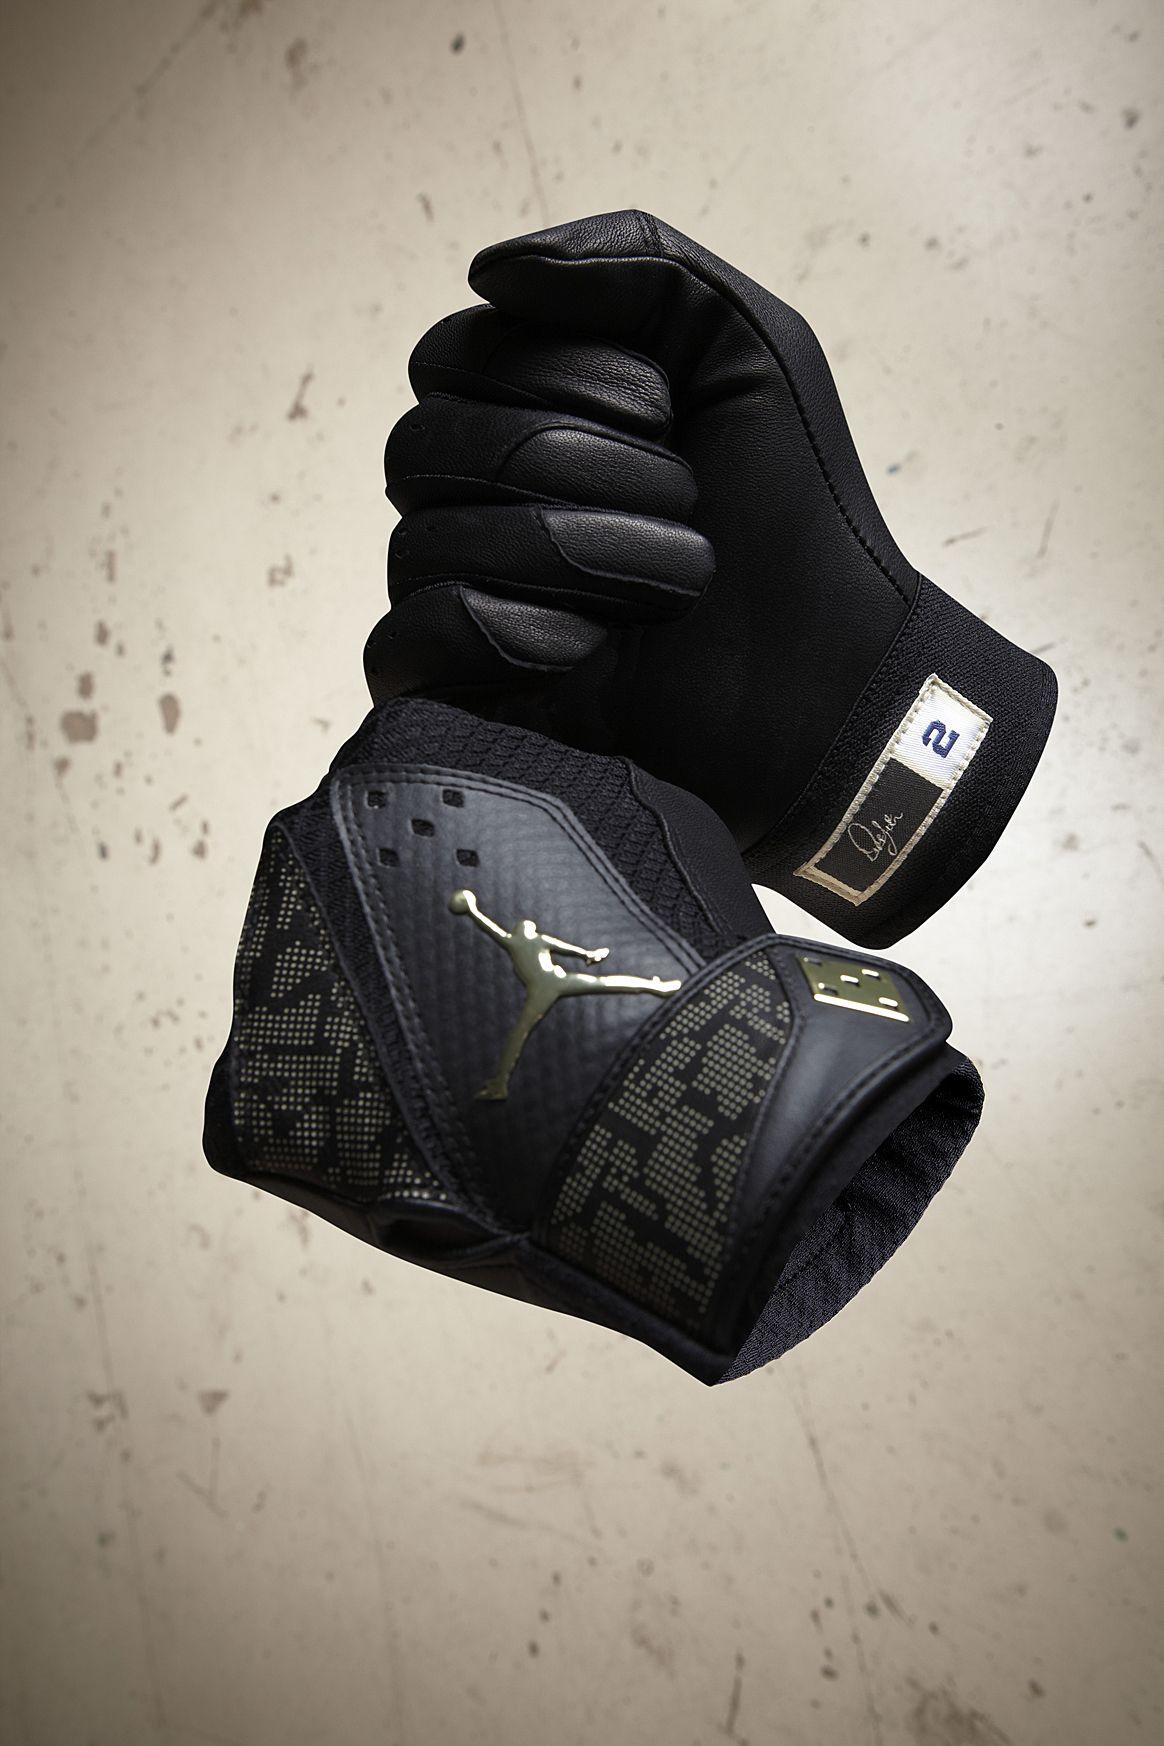 air jordan football gloves